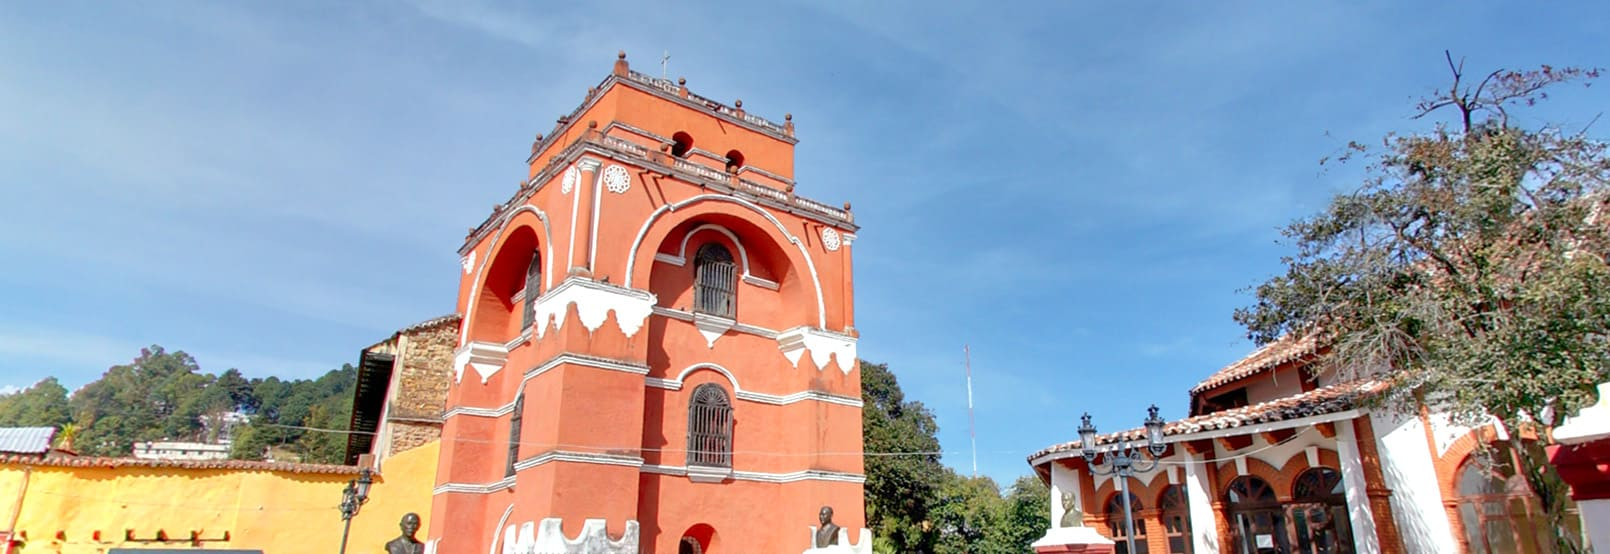 fachada del Arco del Carmen